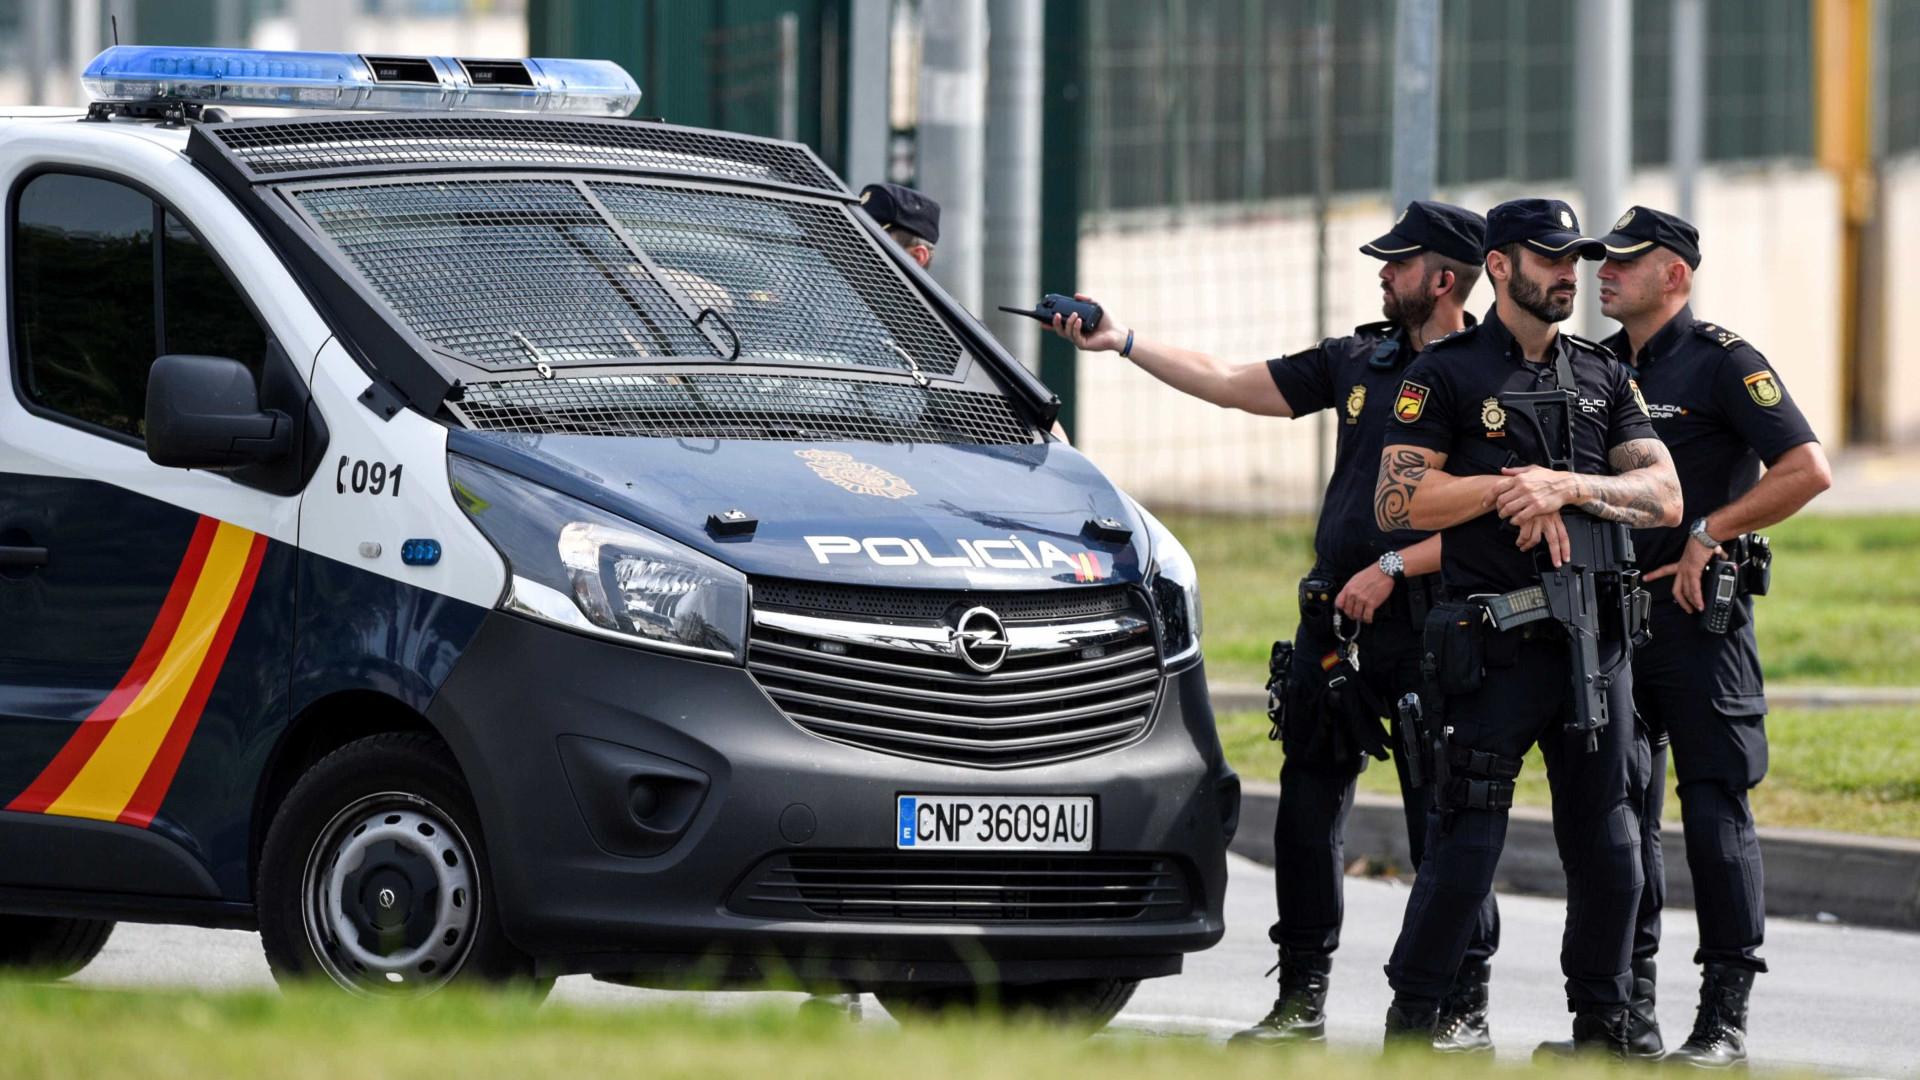 Human Rights Watch acusa polícia espanhola de violência